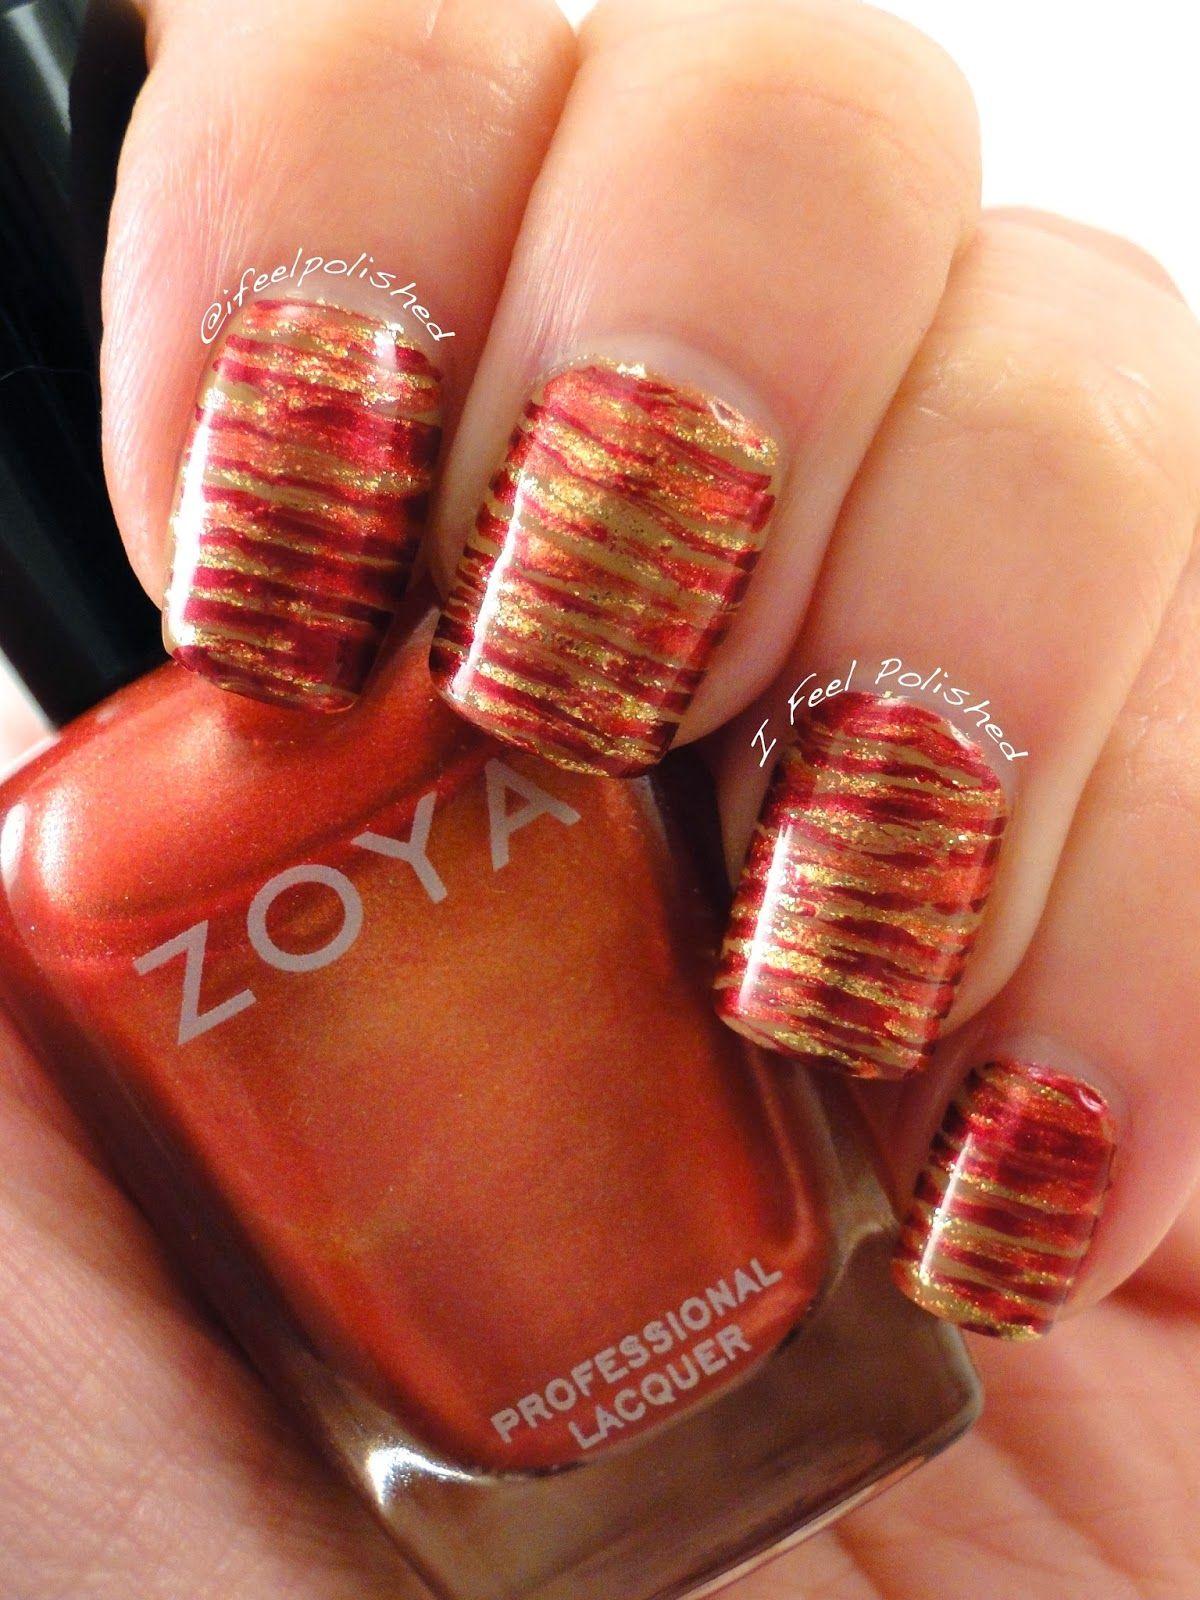 fan brush nail art | Nails | Pinterest | Fan brush nails and Fan brush